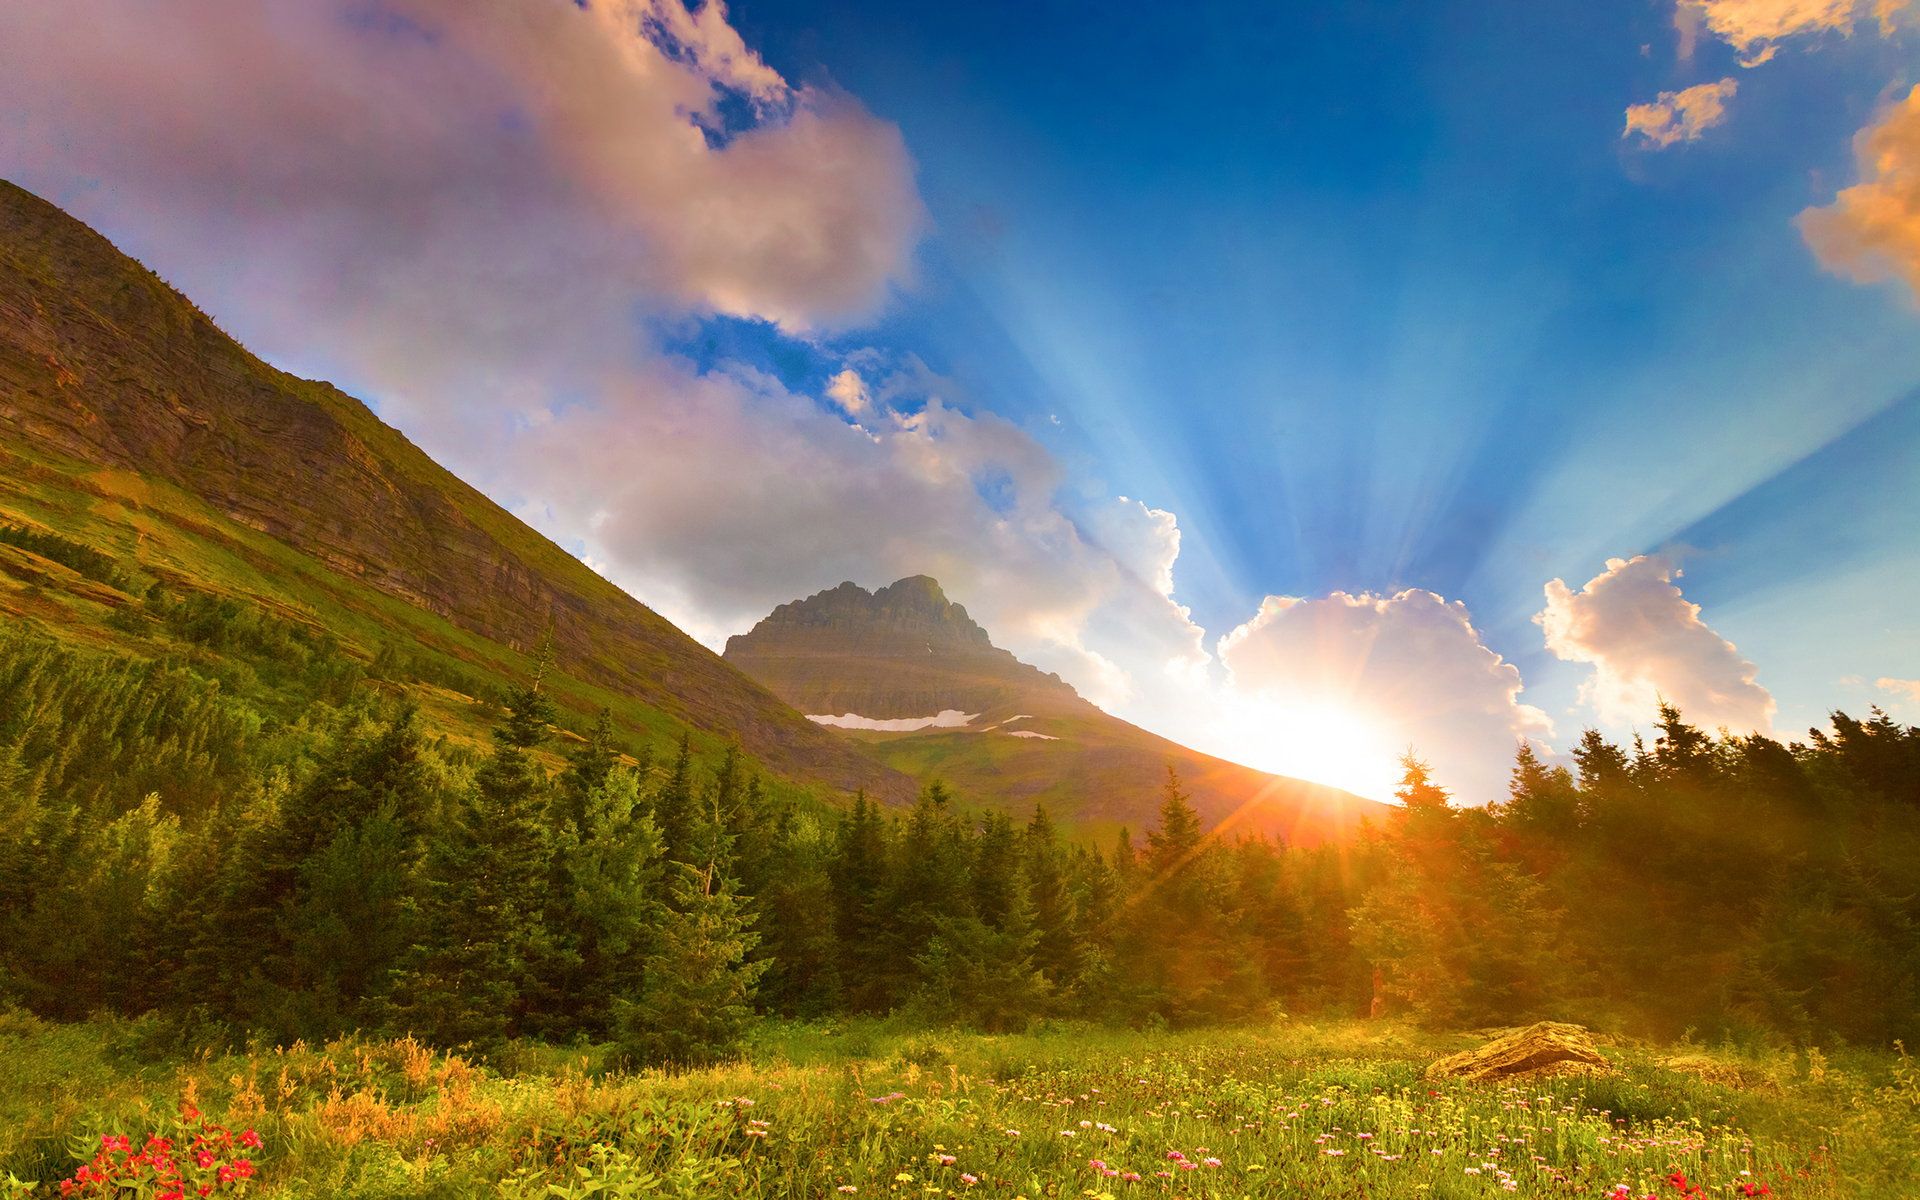 Sunrise mountain scenery